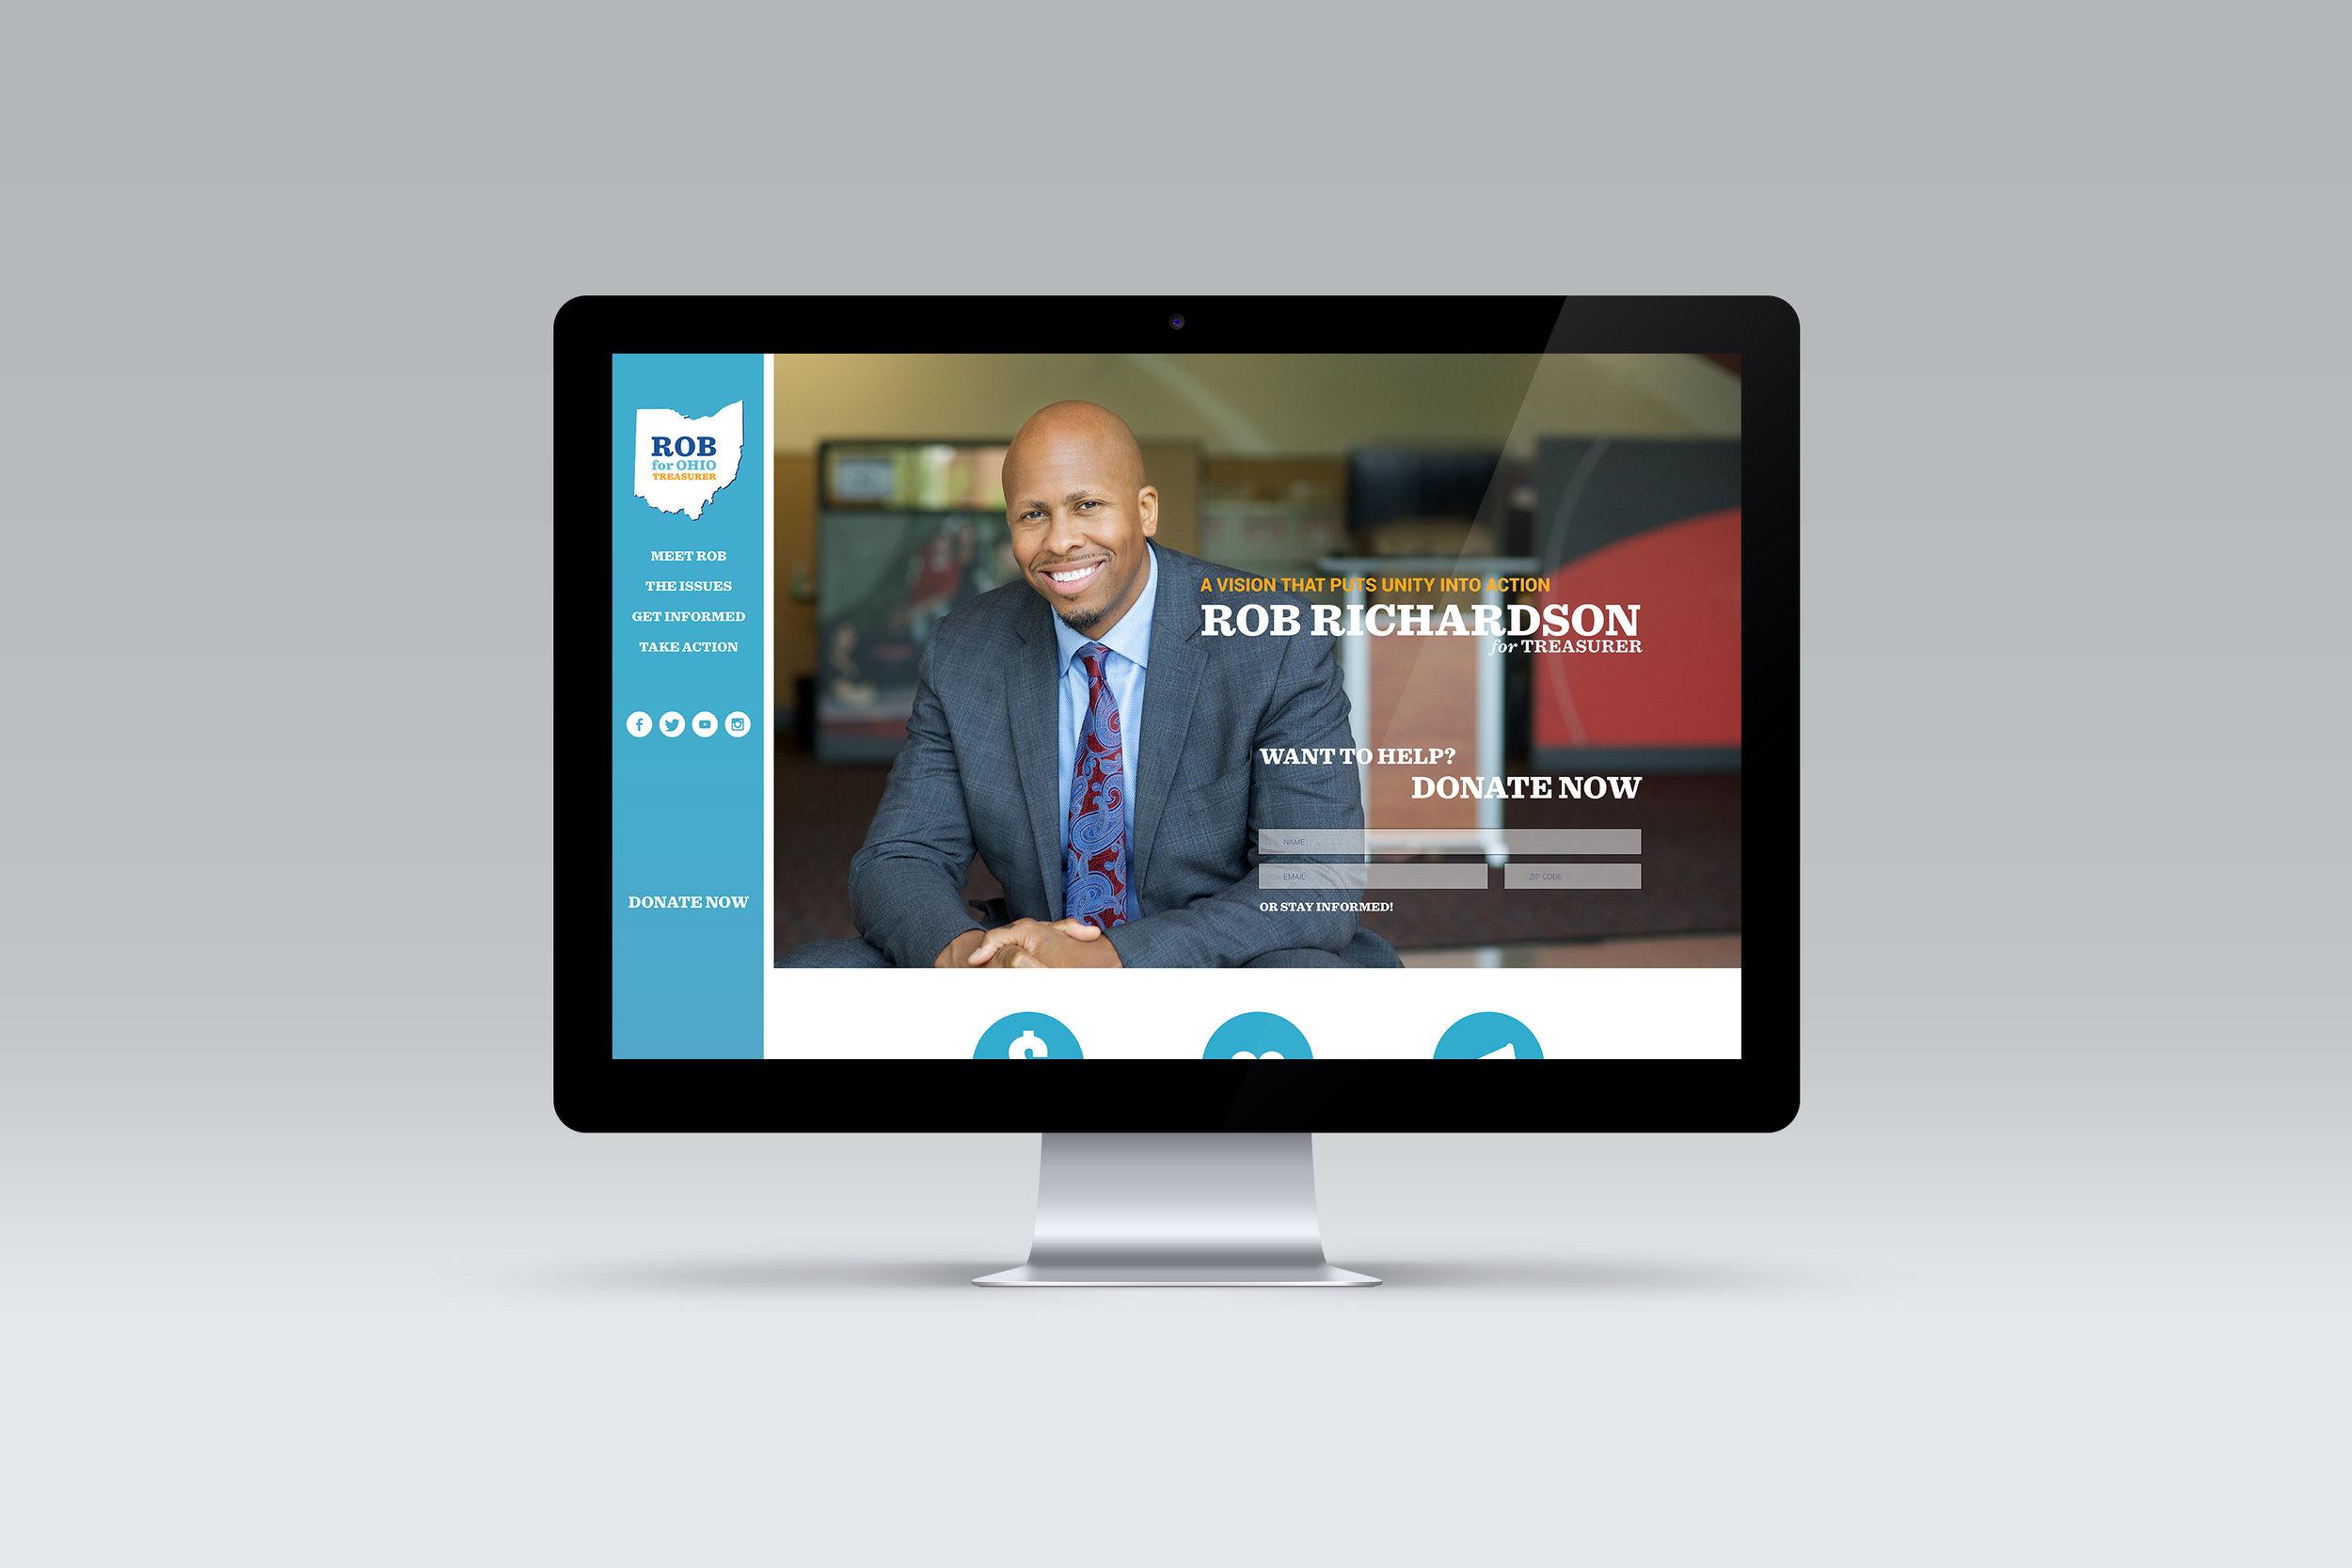 Desktop layout of the Homepage